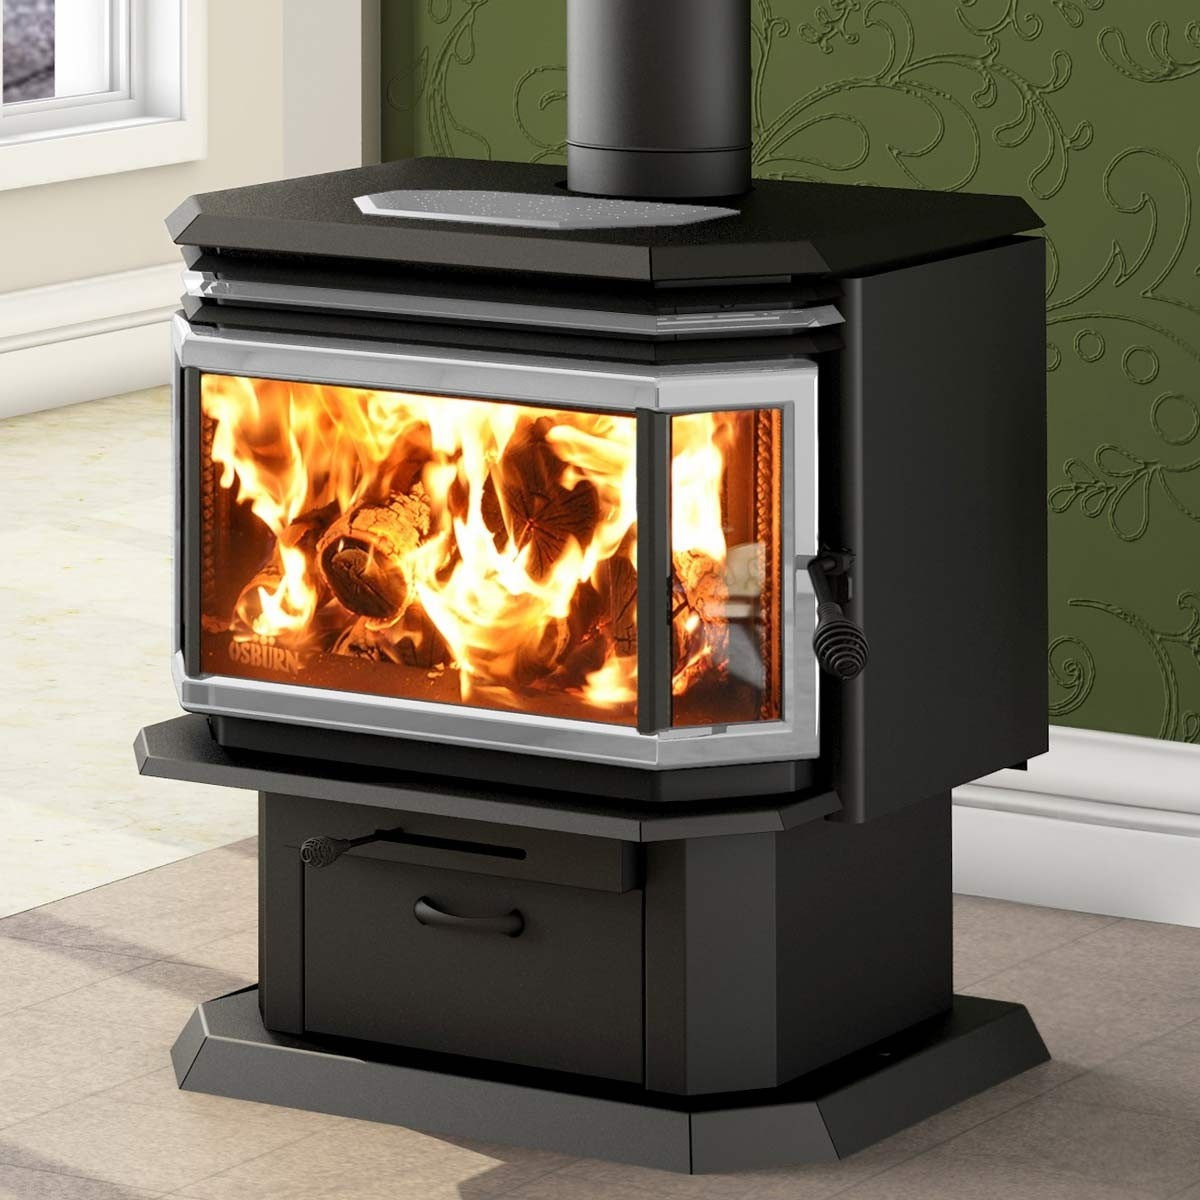 nle5os 2200 00 osburn 2200 metallic black epa wood stove 1